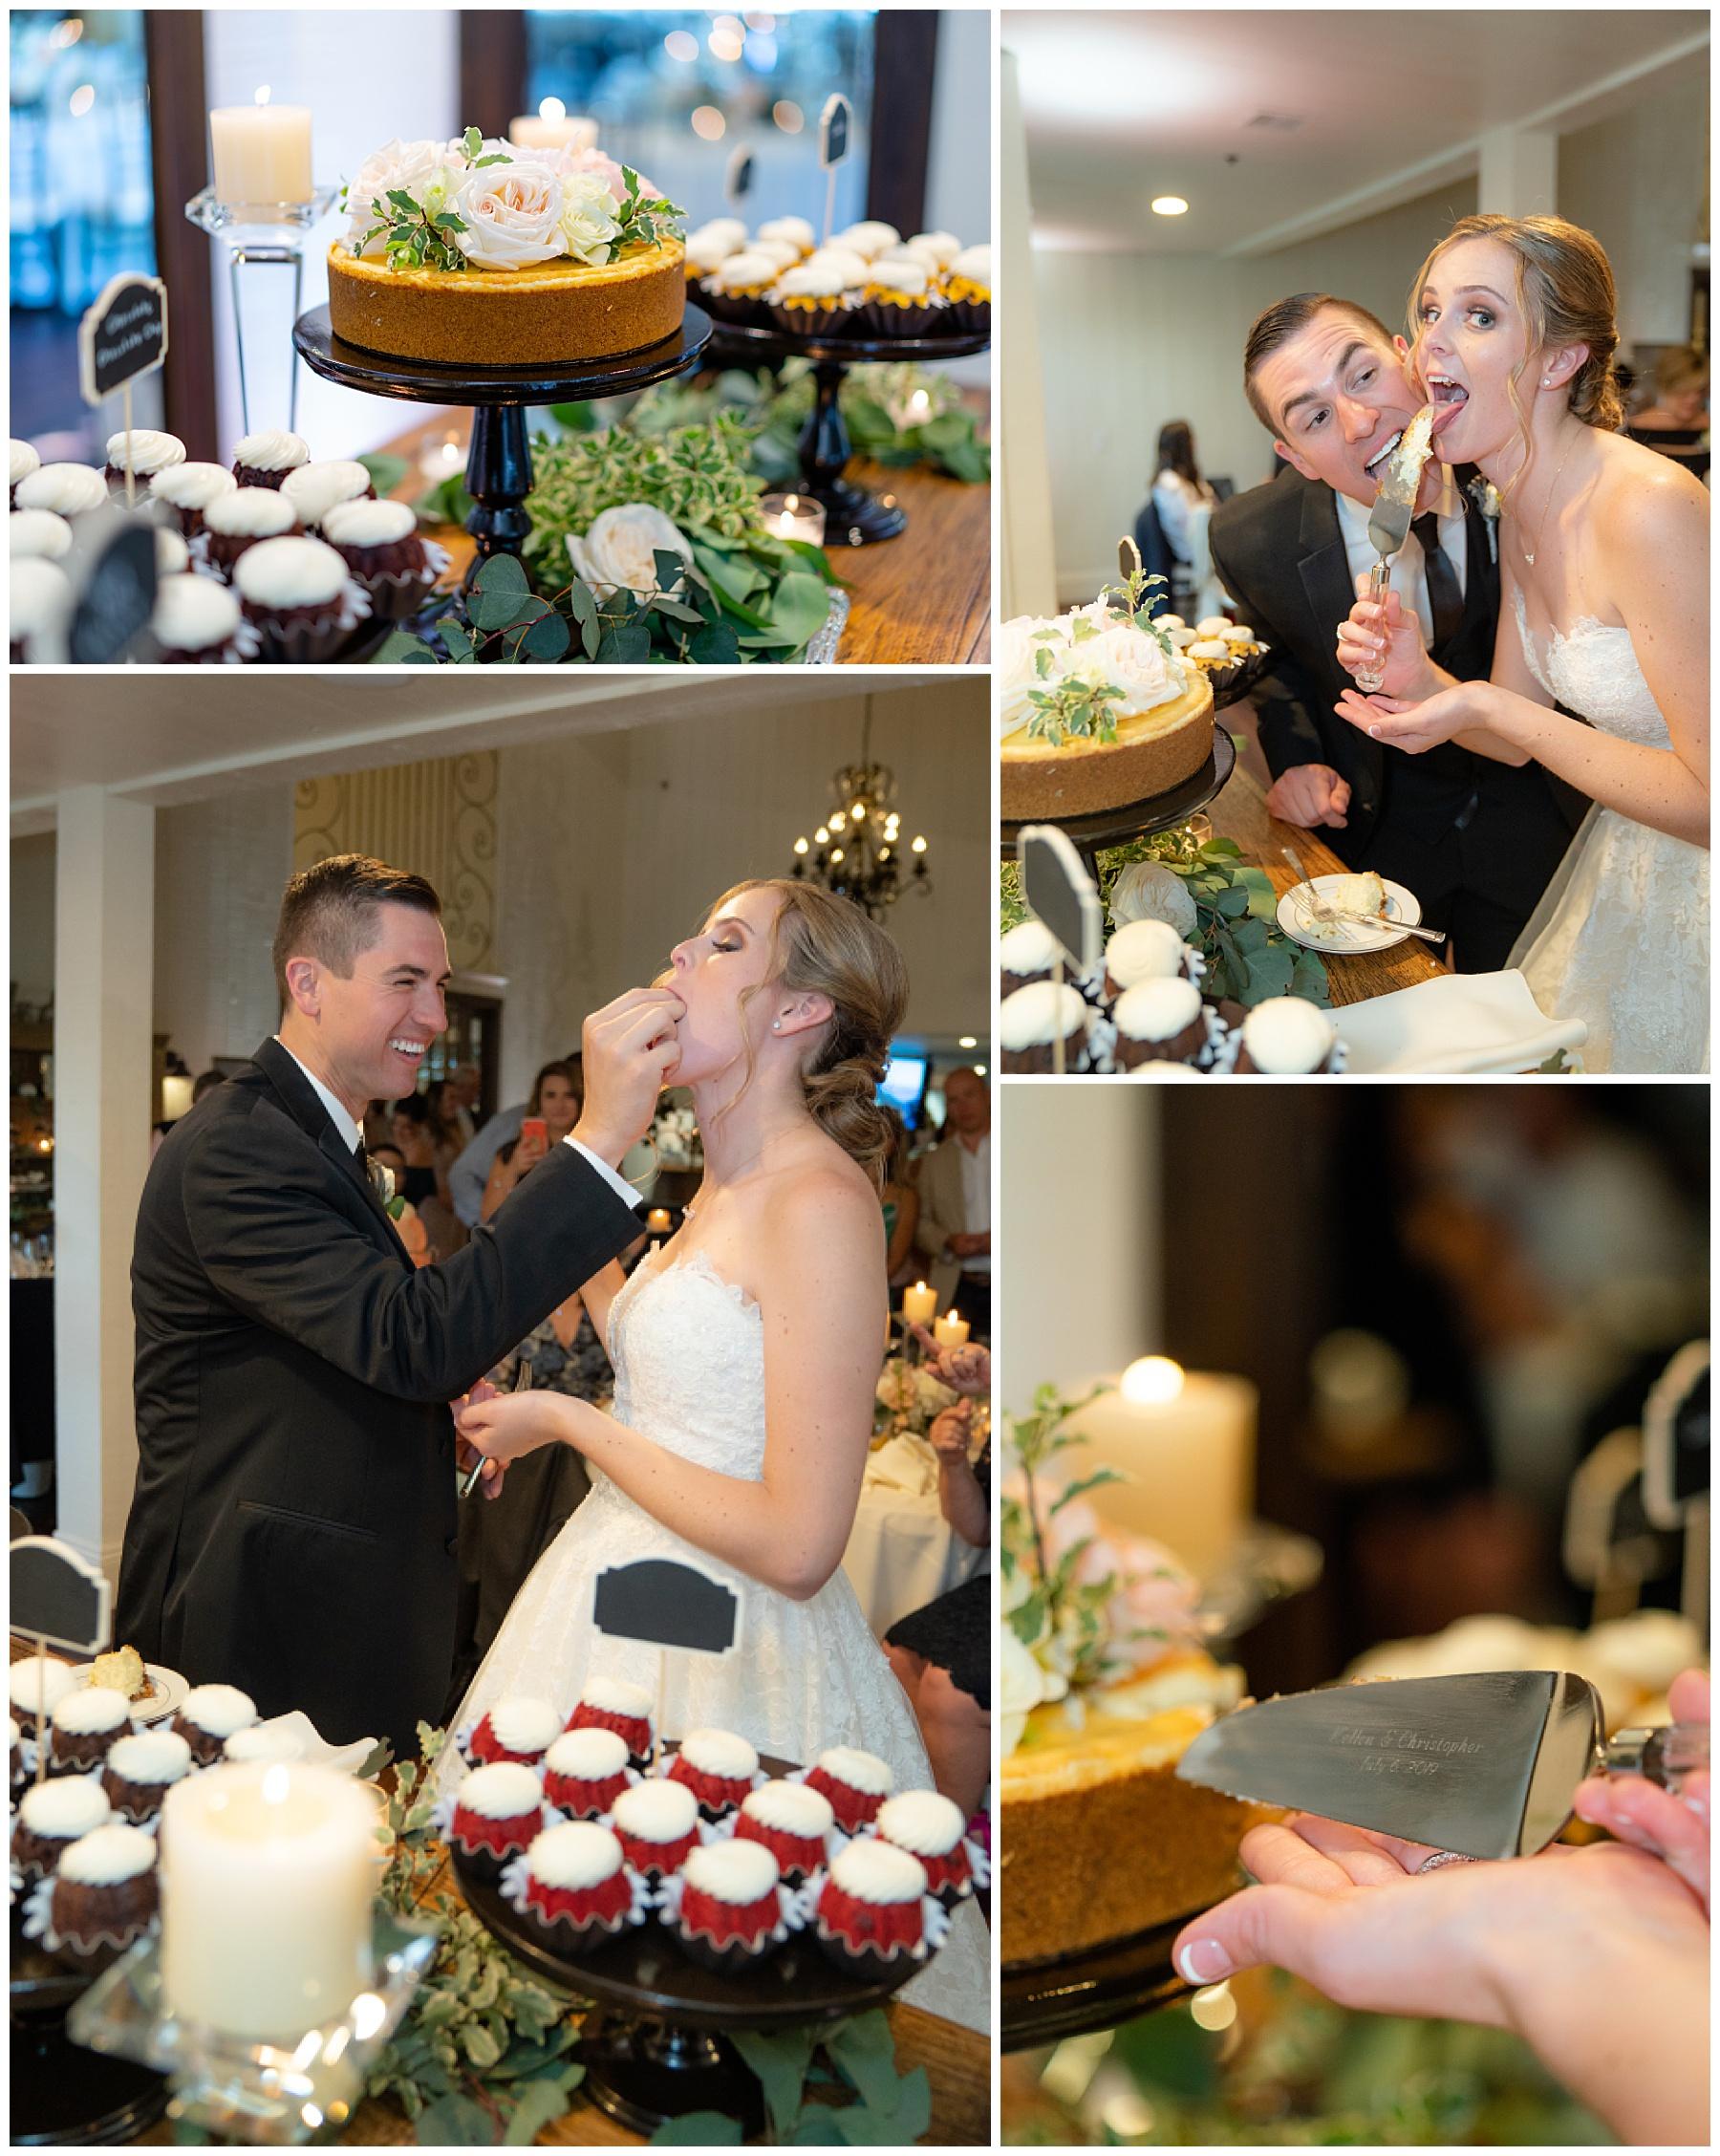 wedding cake cutting non traditional